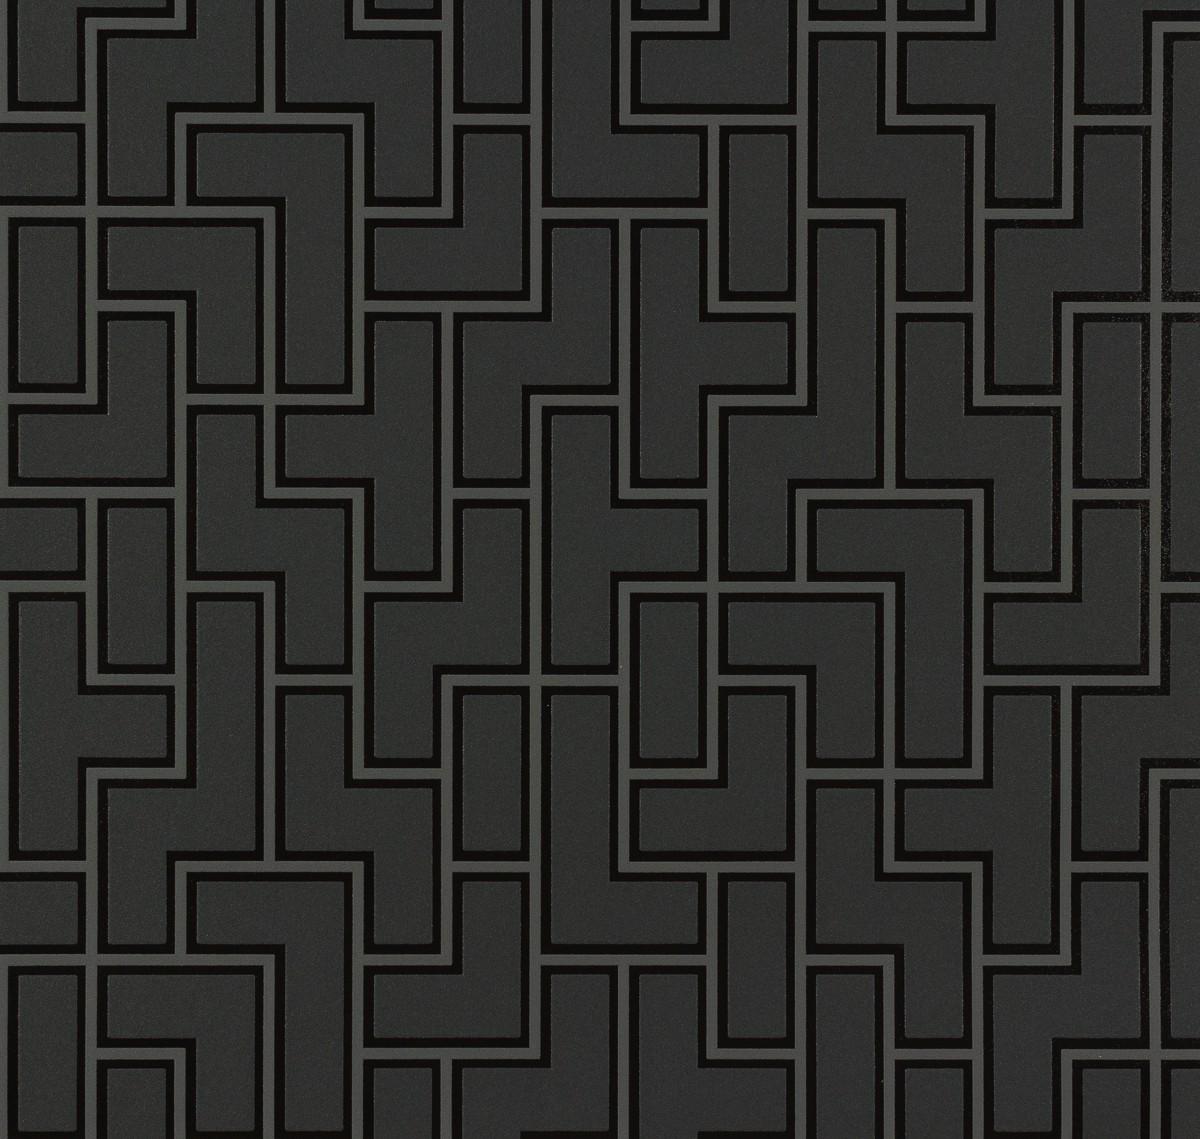 tapete michalsky metropolis grafisch schwarz 93937 1. Black Bedroom Furniture Sets. Home Design Ideas